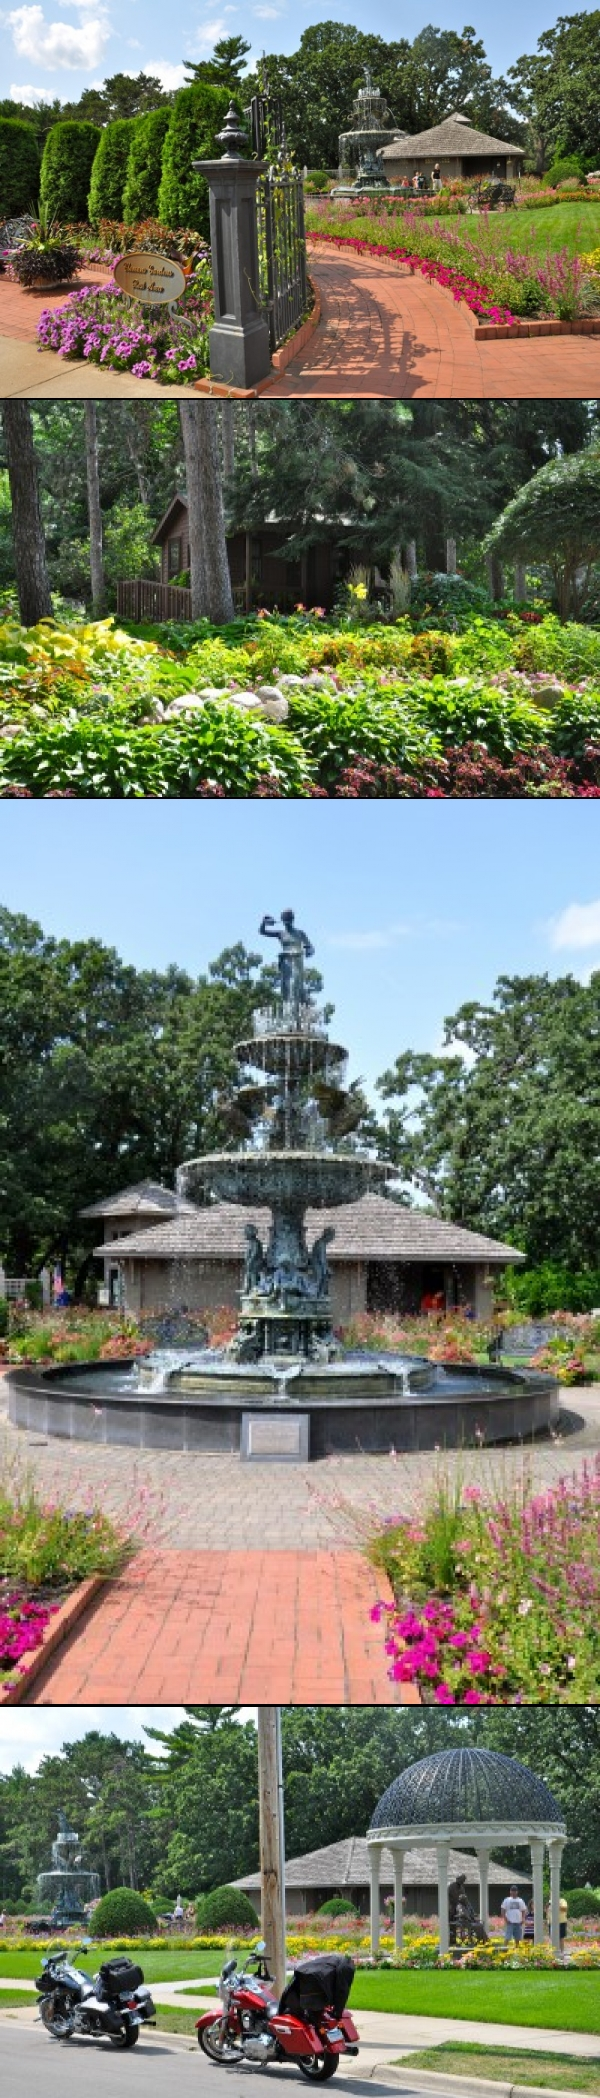 ef856519fdf3e342d7f5011a90bcf155 - Best Time To Visit Munsinger Gardens